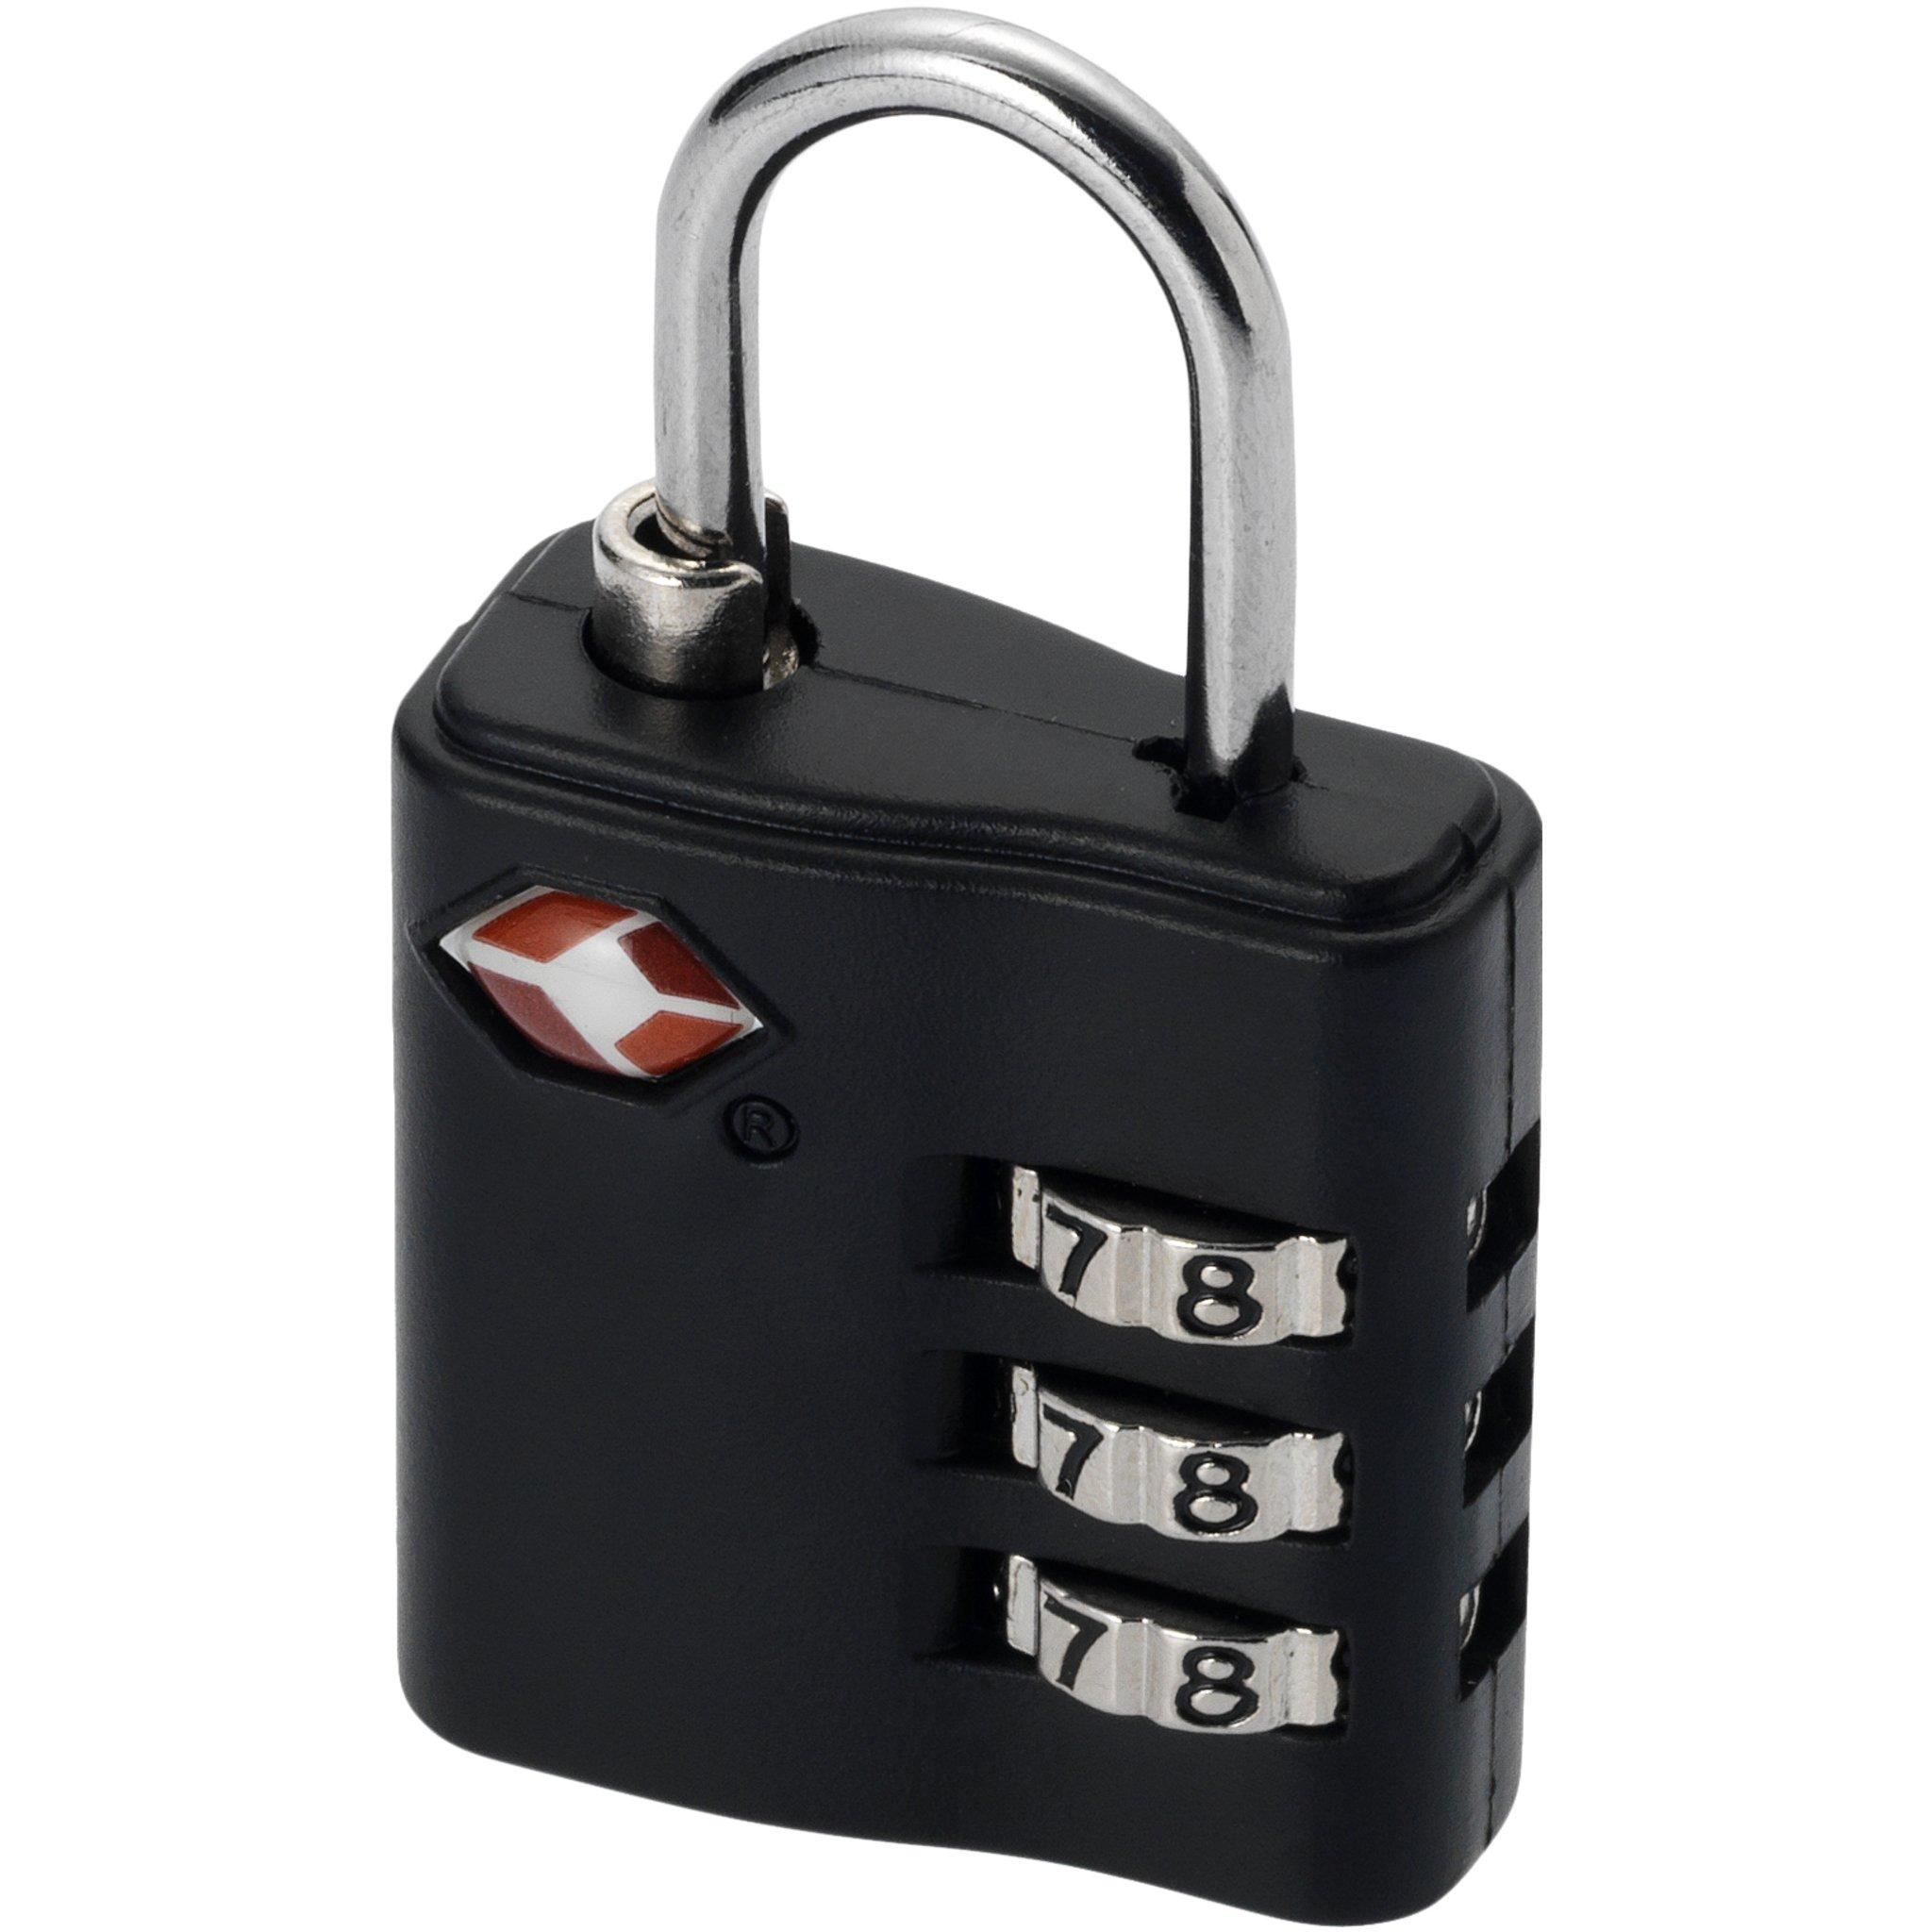 Bullet Kingsford luggage lock